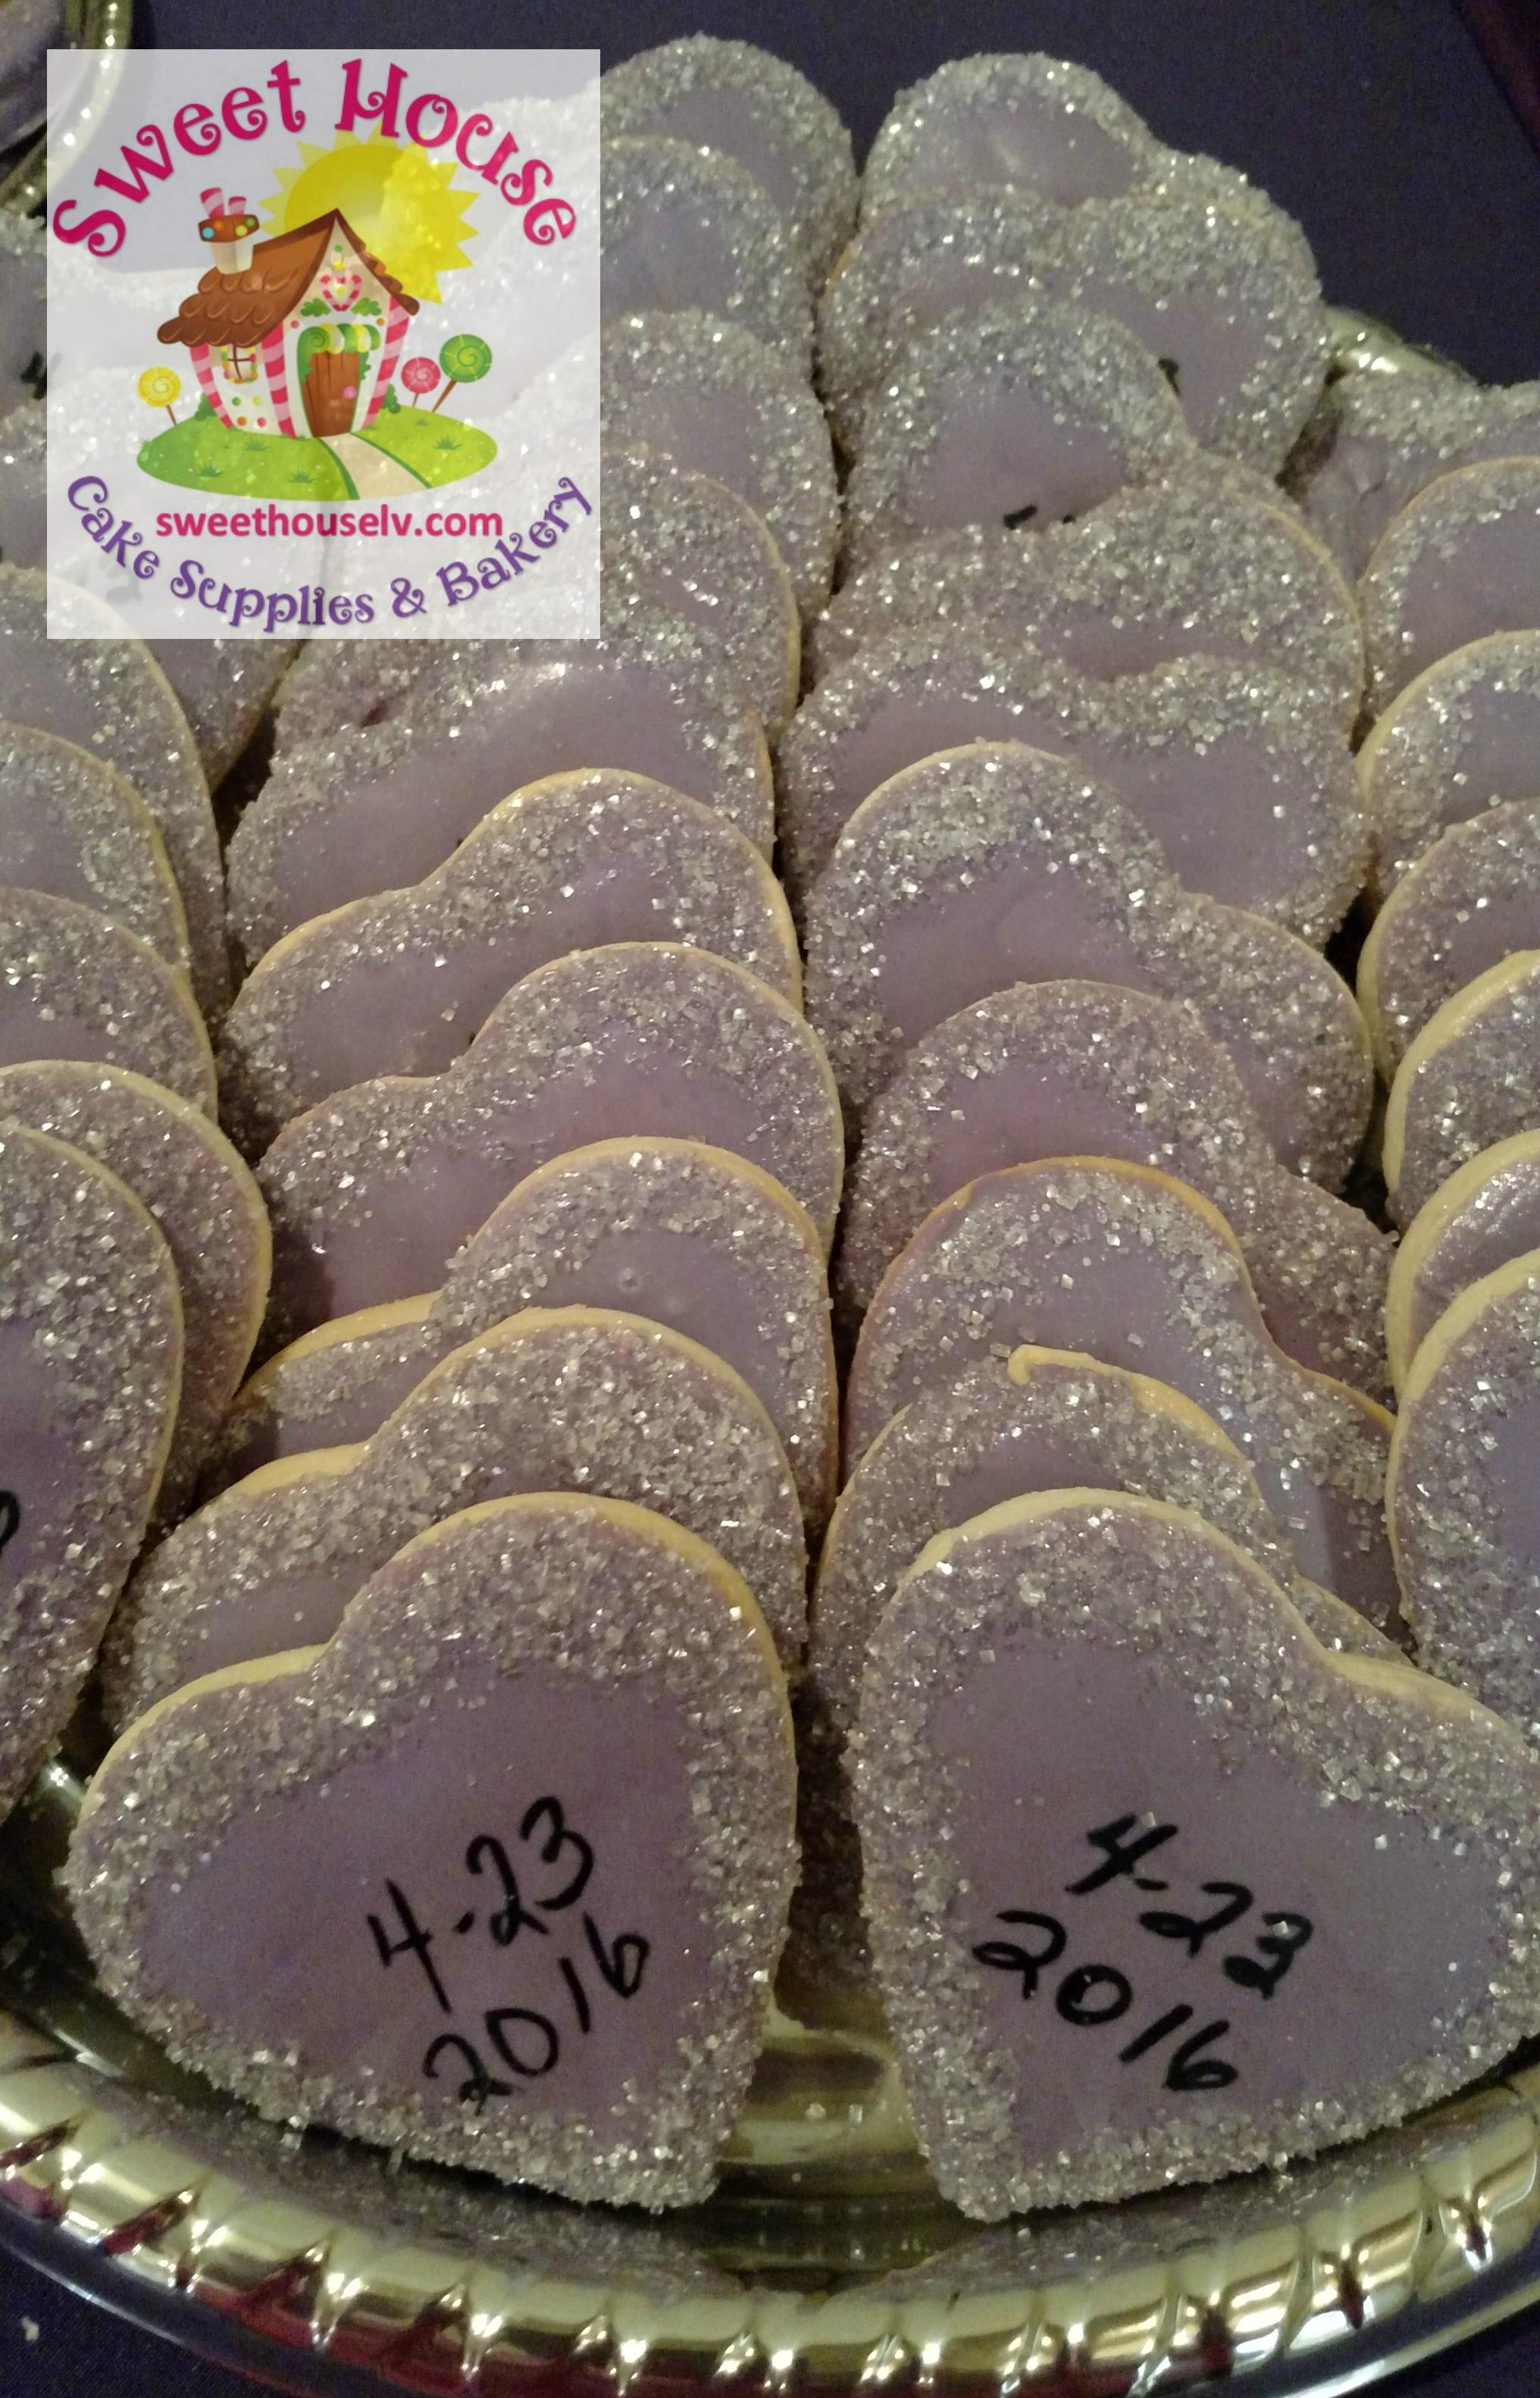 Heart Wedding Cookies with Date